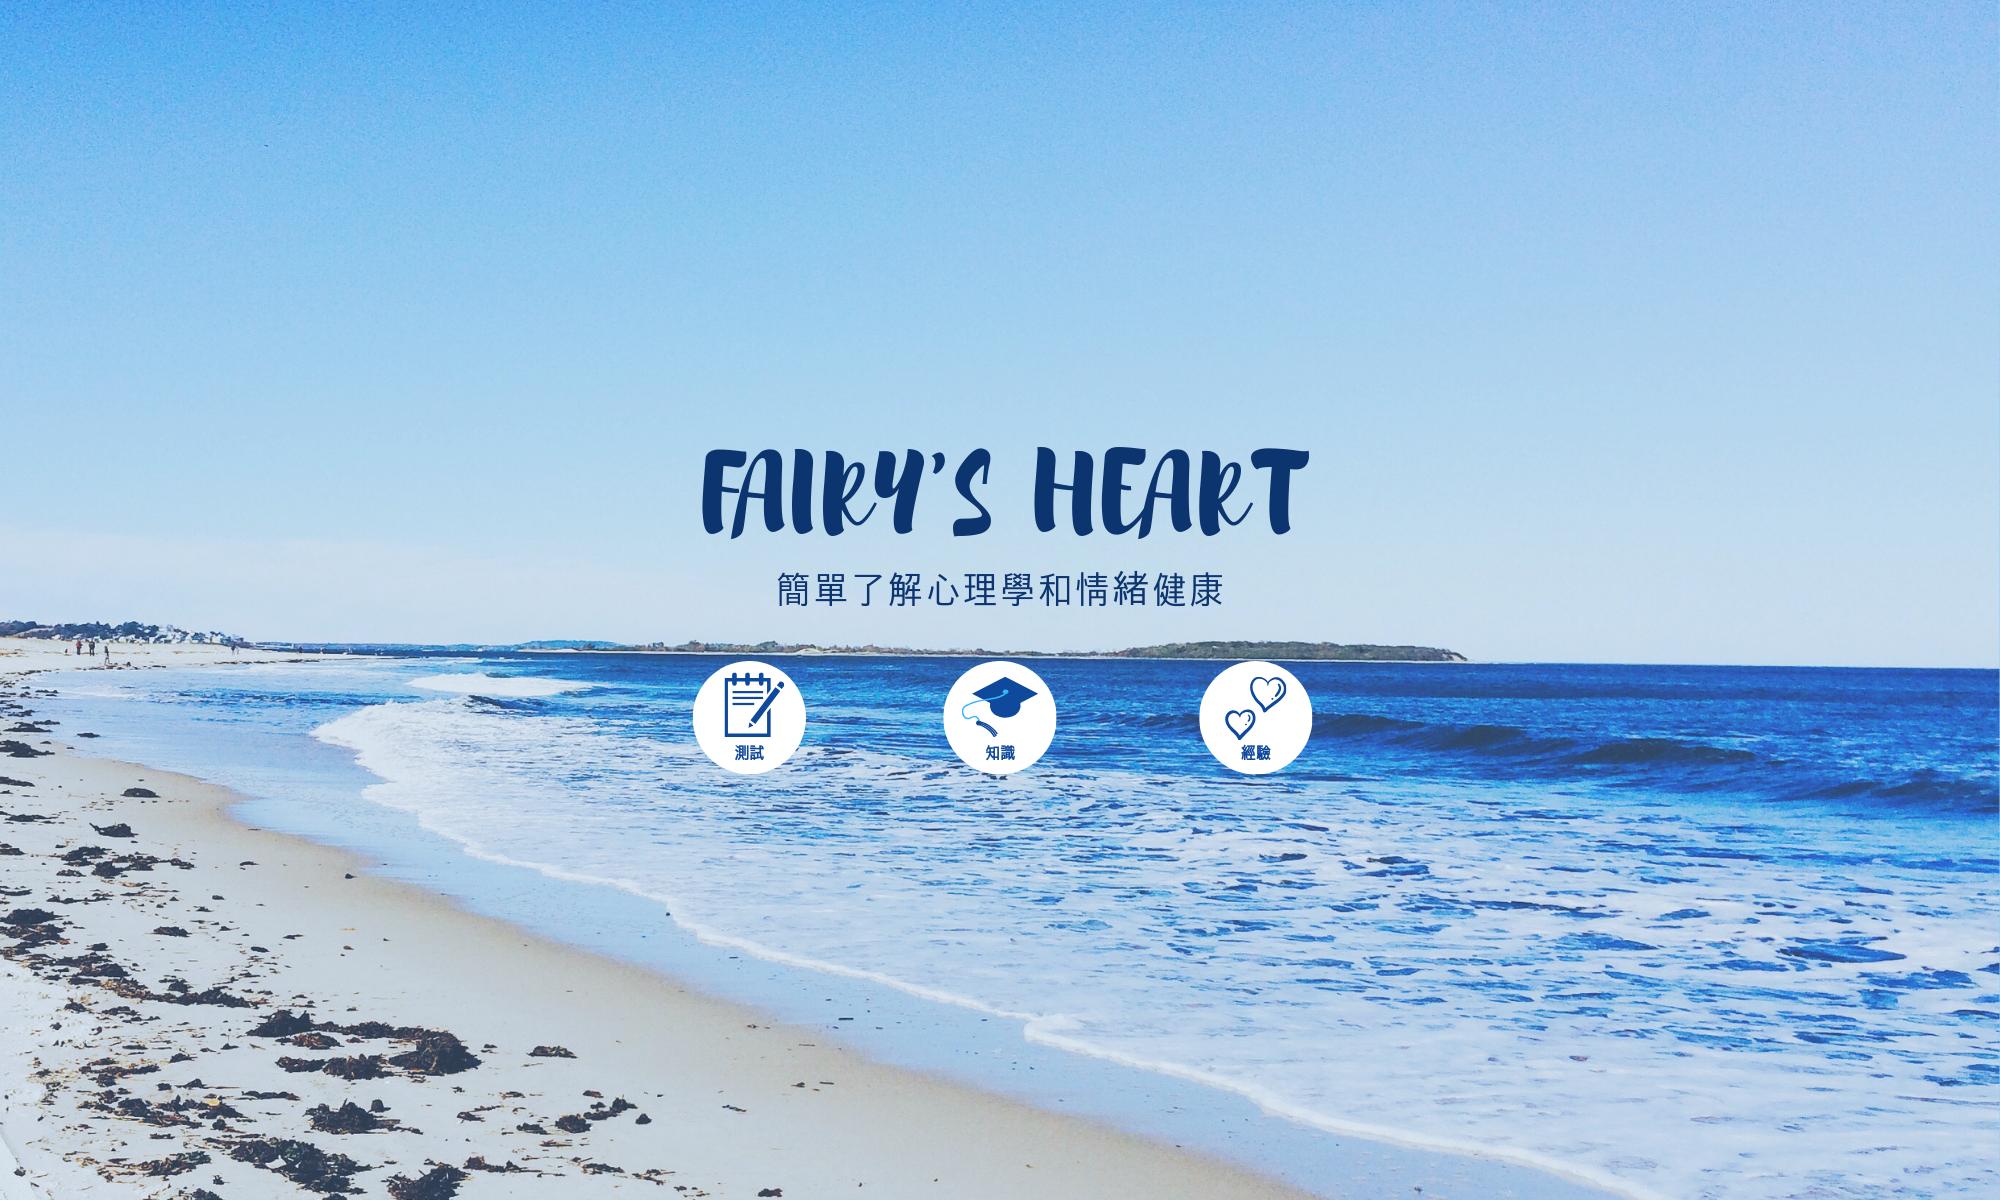 Fairy's Heart